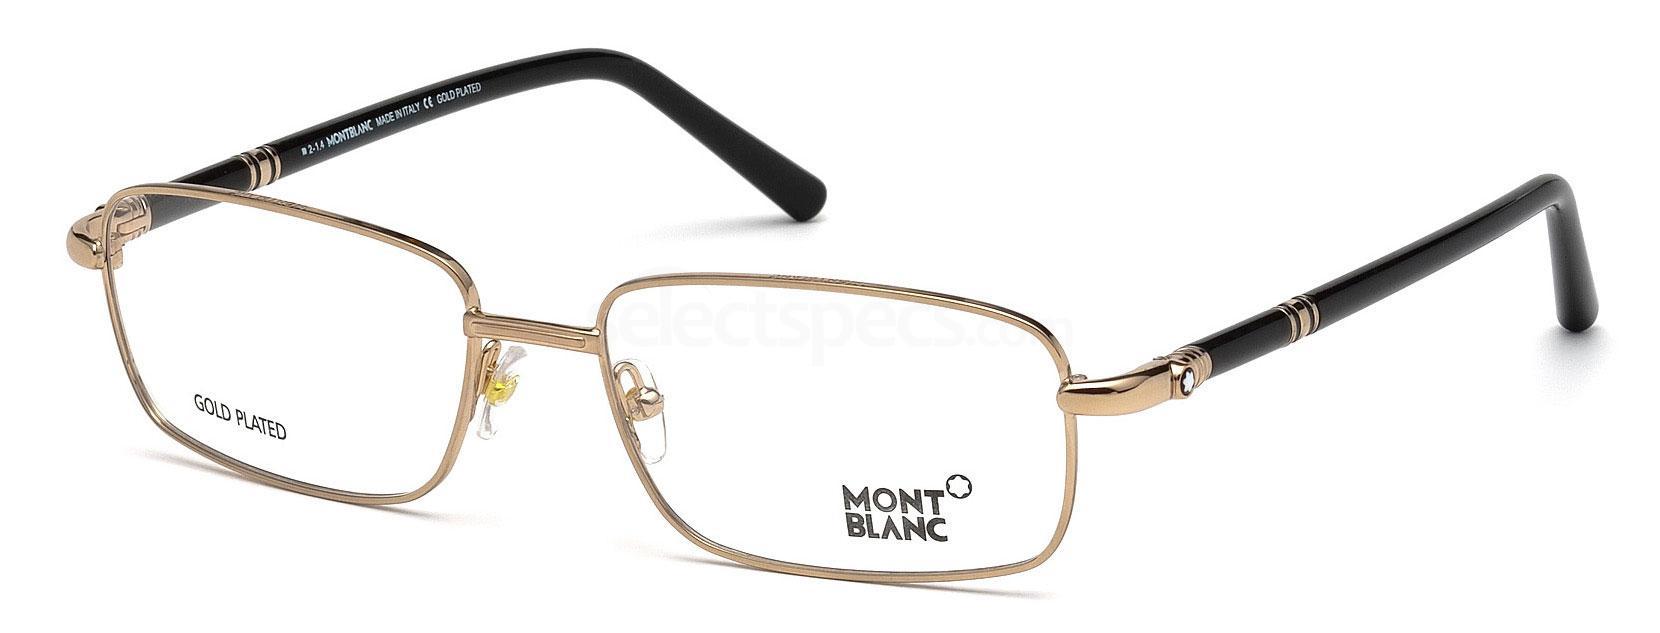 033 MB0525 Glasses, Mont Blanc